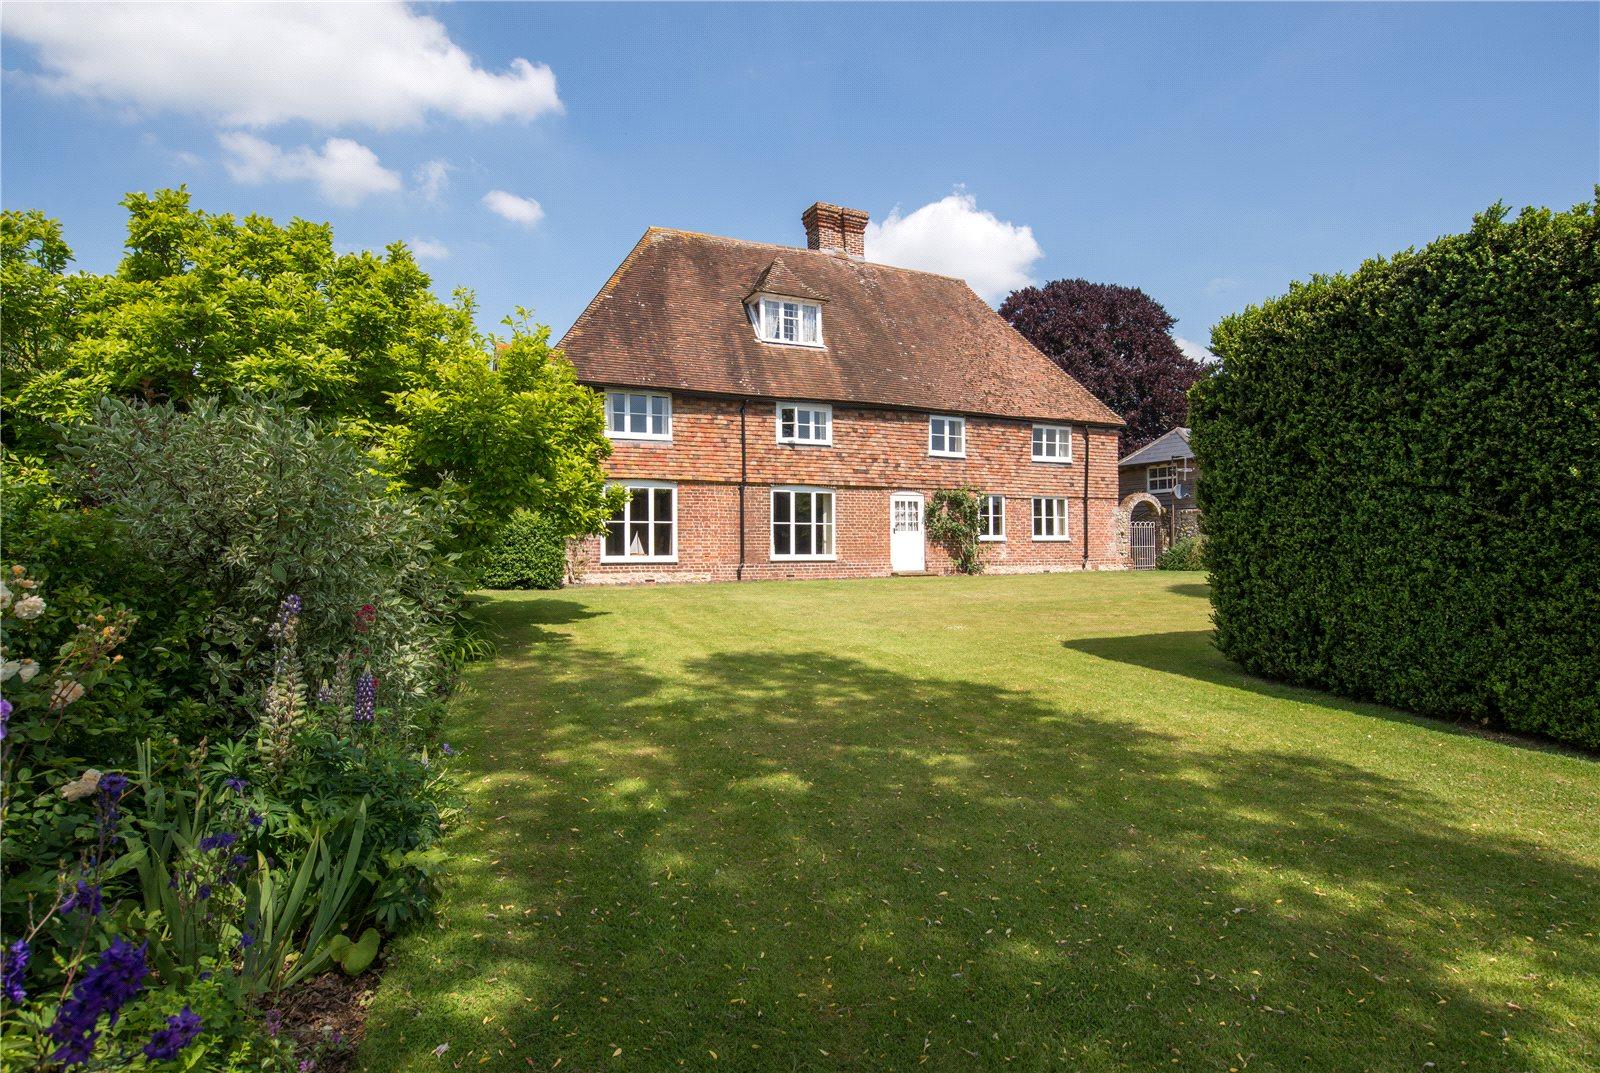 Maison unifamiliale pour l Vente à Barnfield Road, Charing Heath, Ashford, Kent, TN27 Ashford, Angleterre